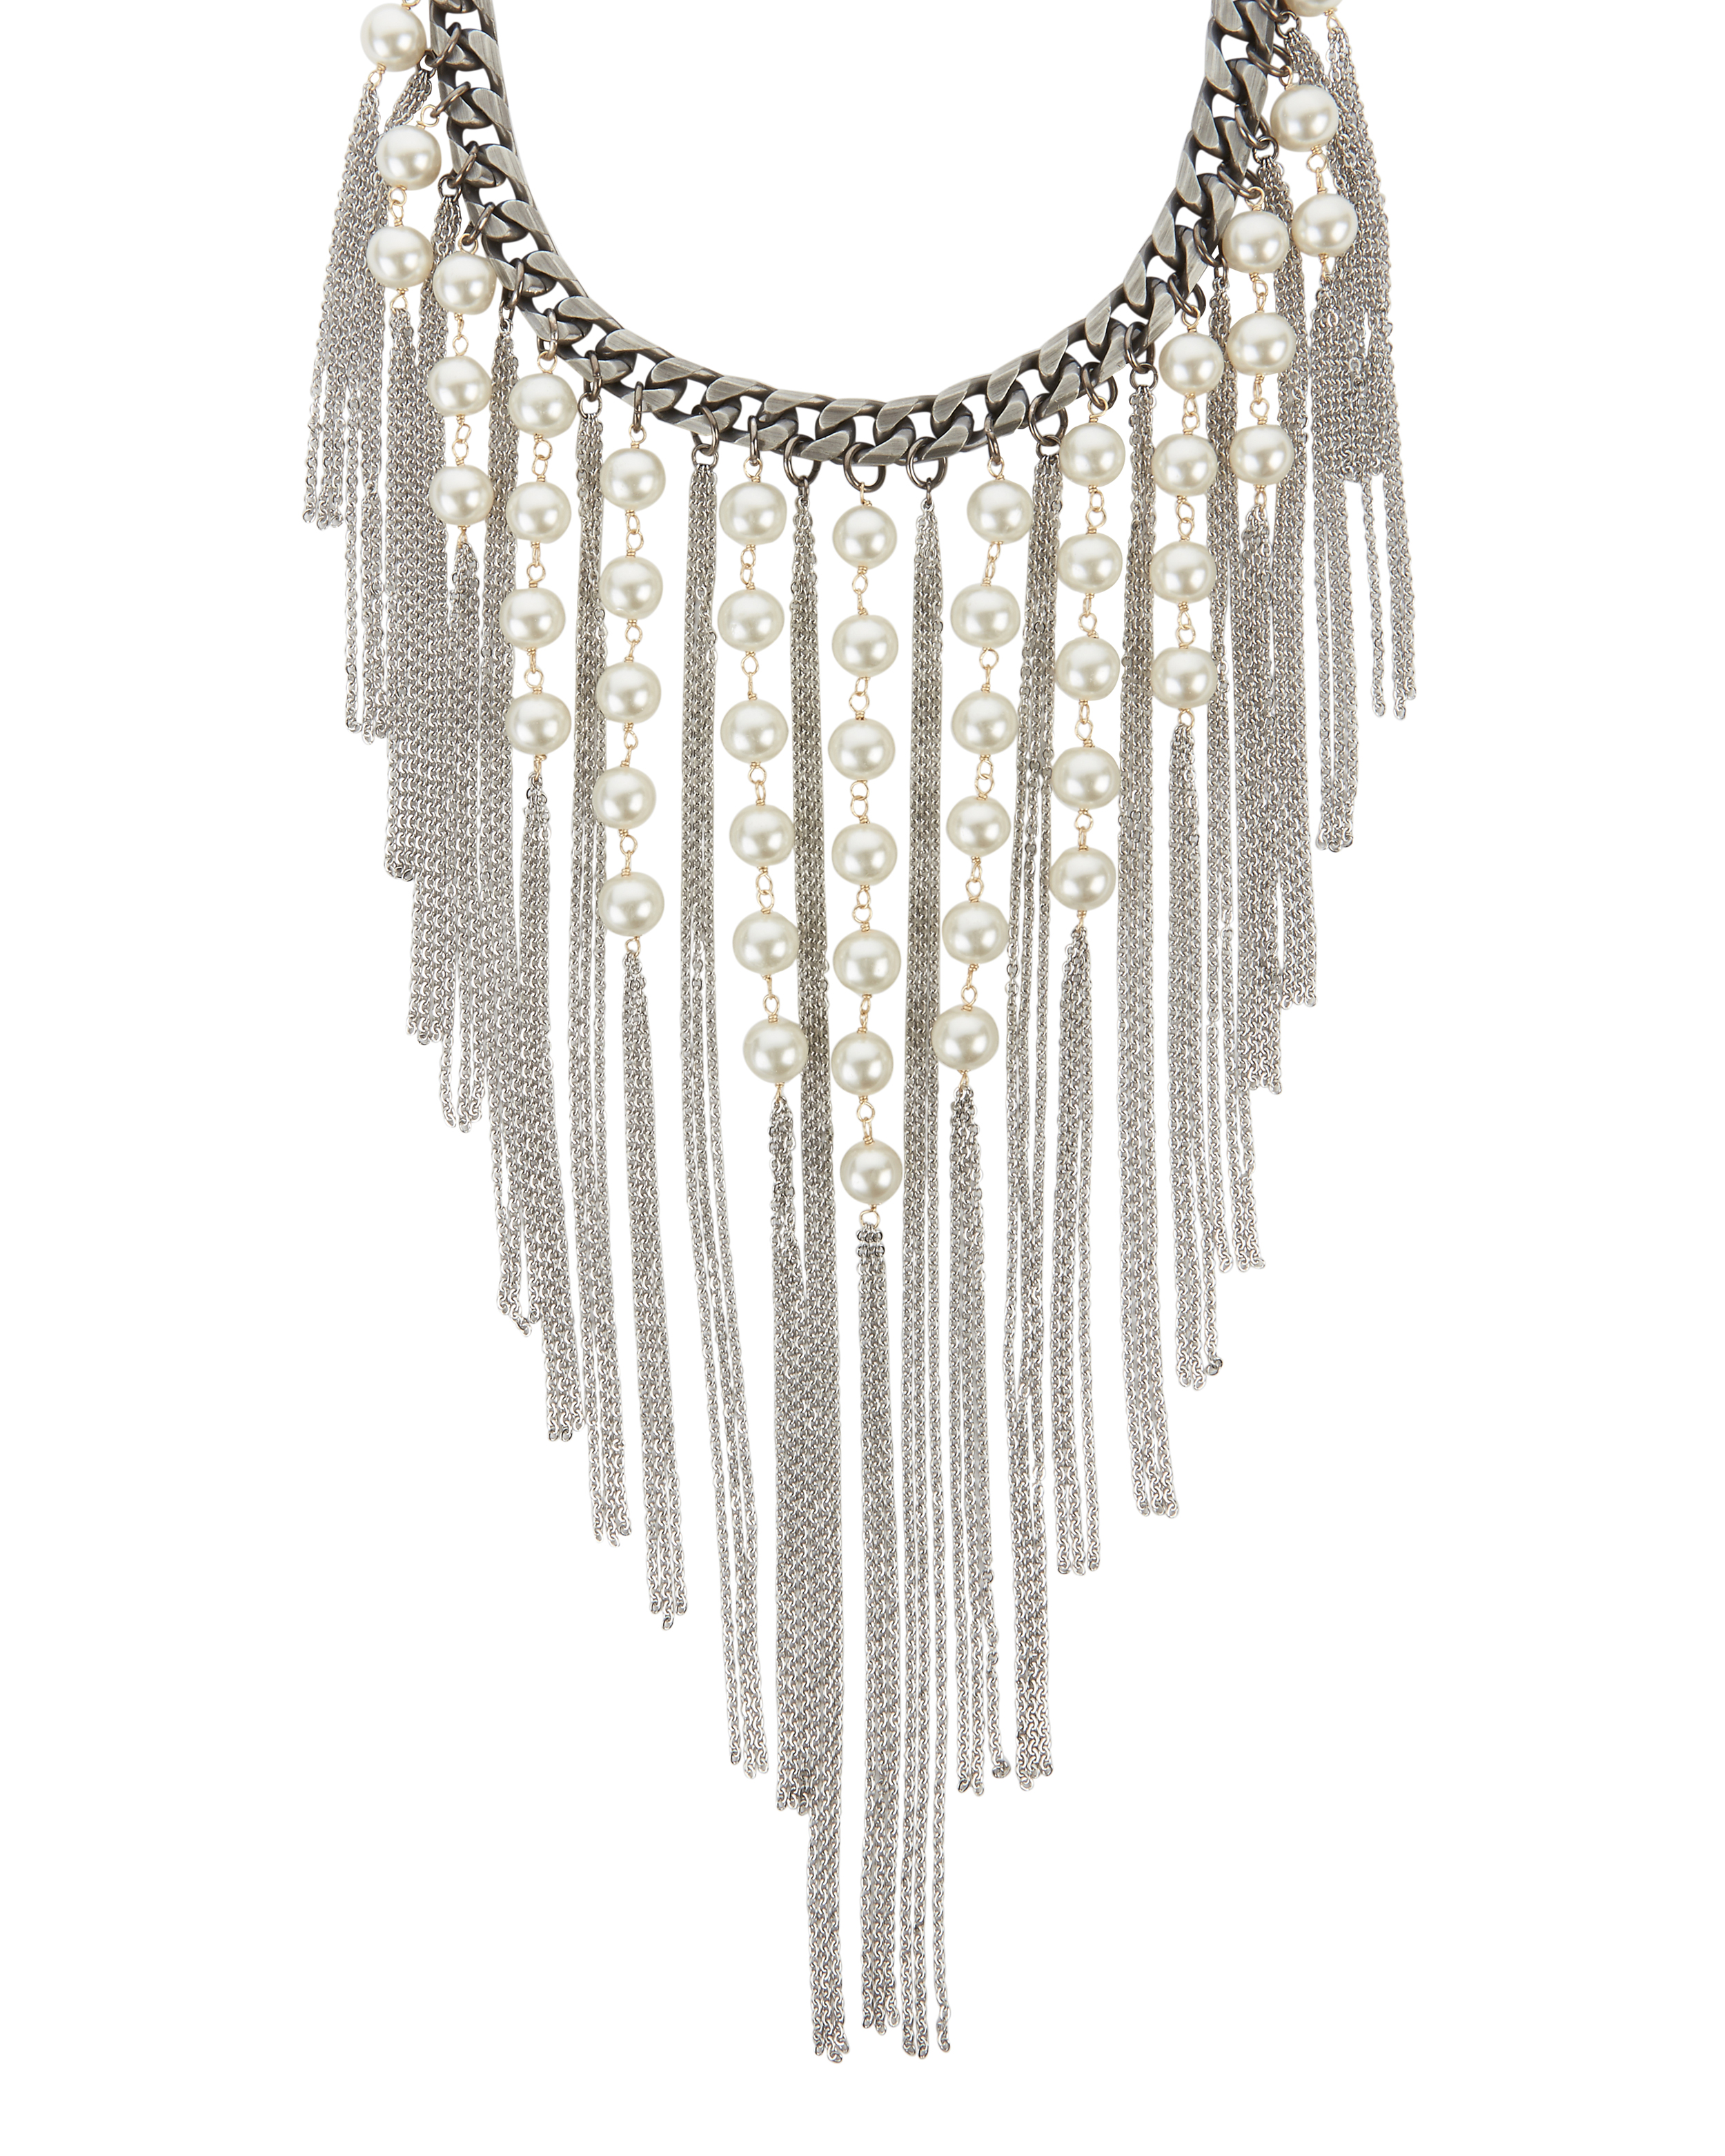 Laura Cantu Pearl Fringe Necklace Intermix 174